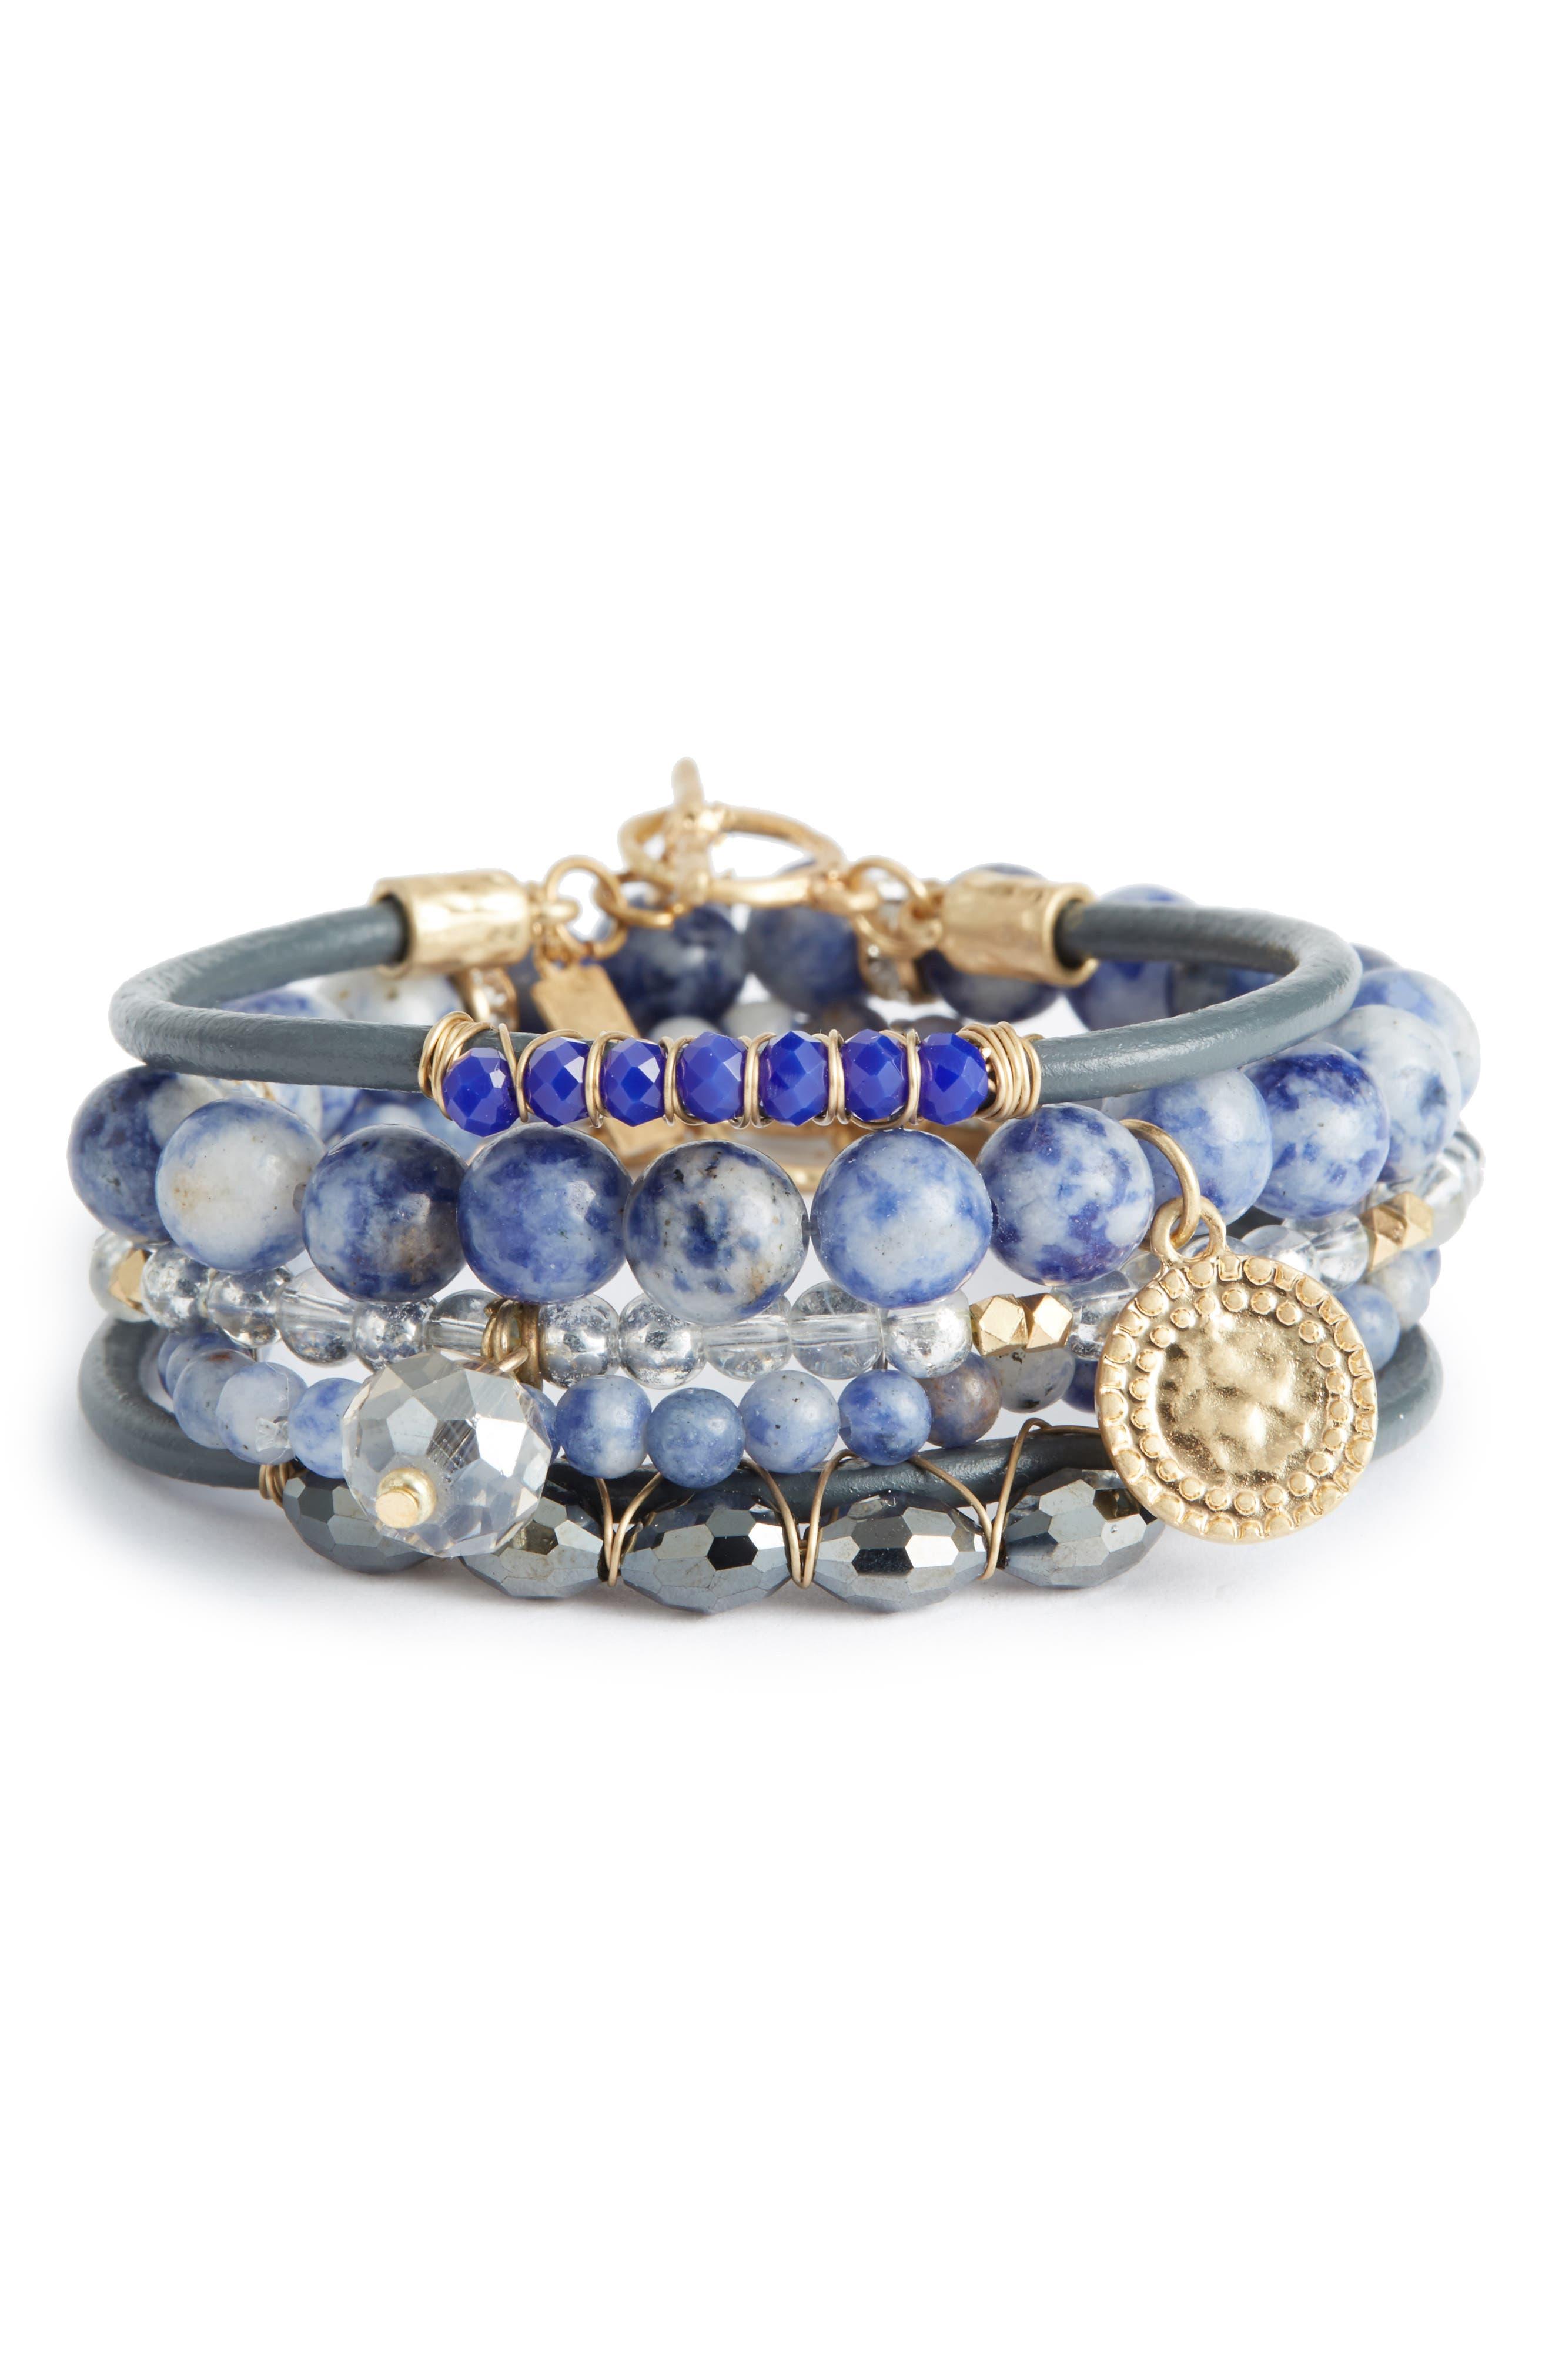 Alternate Image 1 Selected - Canvas Jewelry 5-Piece Semiprecious Stone Stacking Bracelet